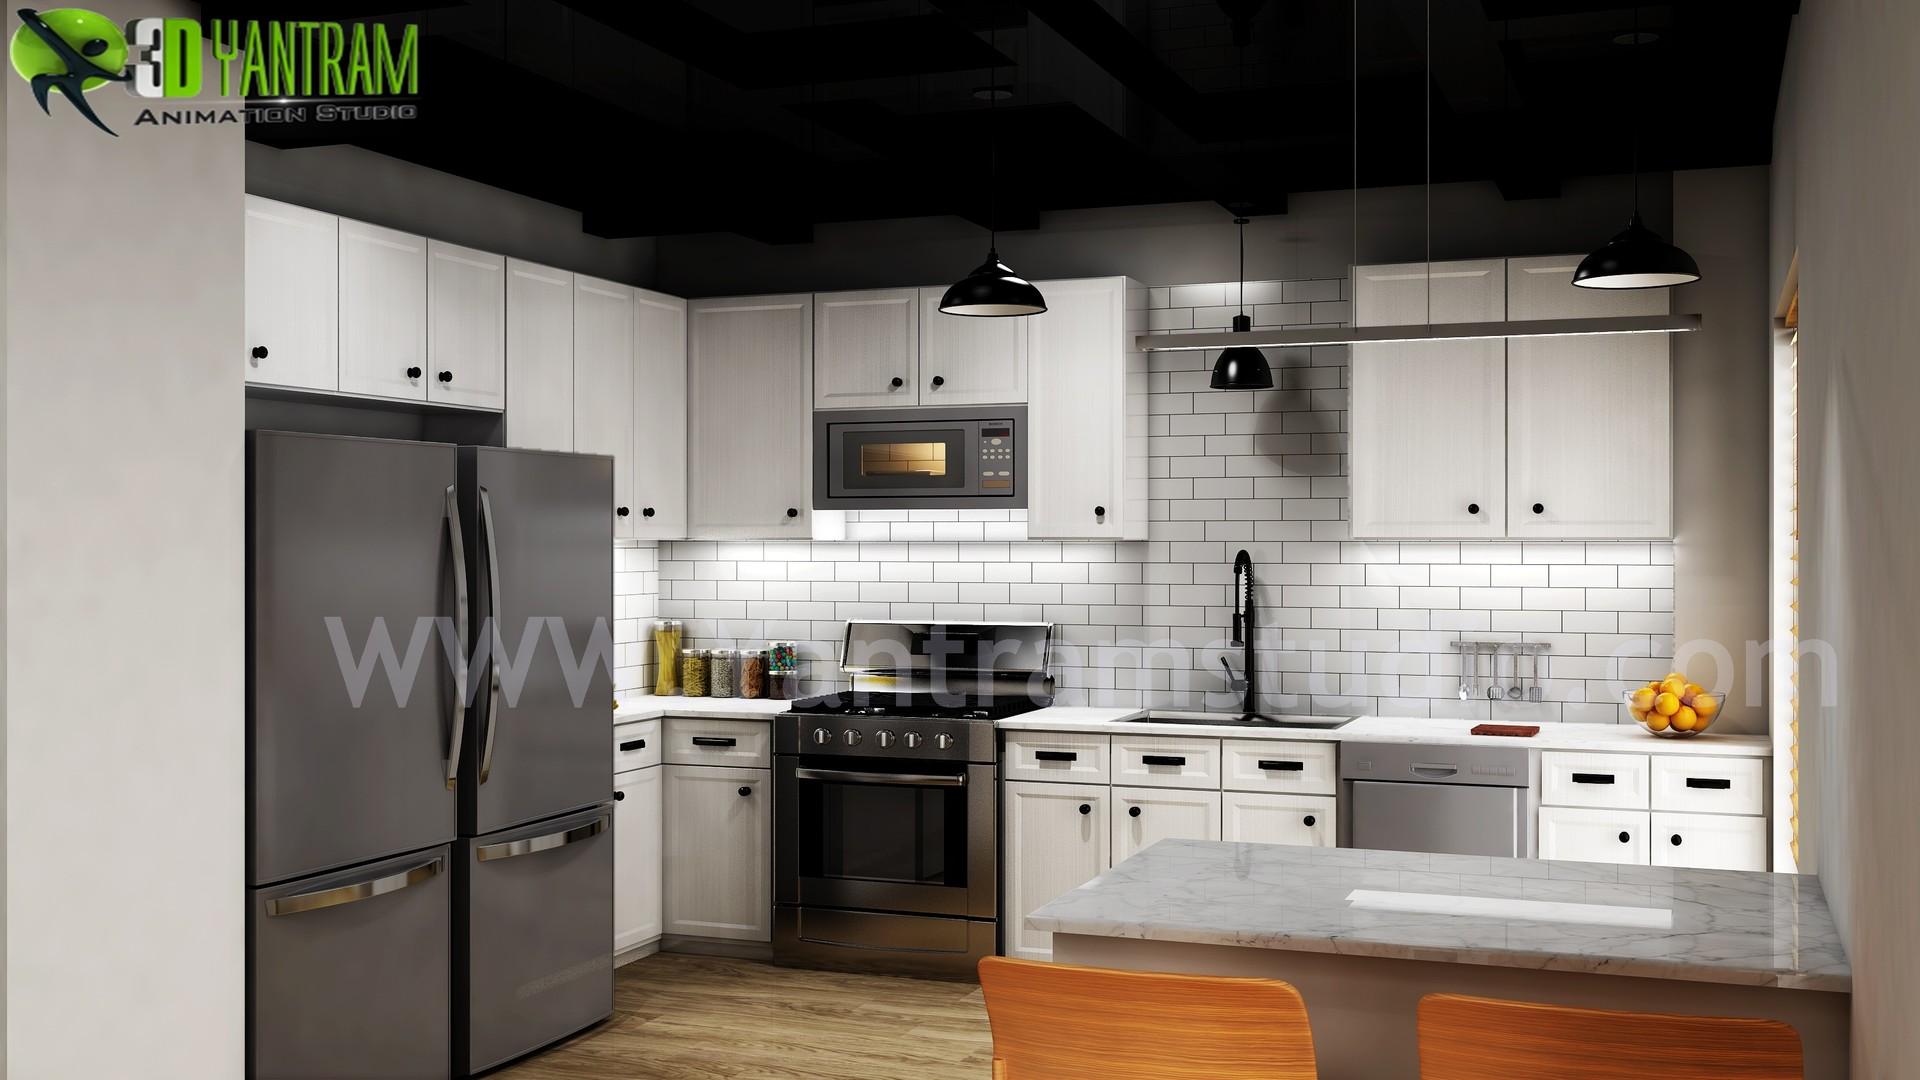 Artstation Modern Small Kitchen Design Ideas By Yantram 3d Interior Rendering Services Berlin Germany Yantram Architectural Design Studio